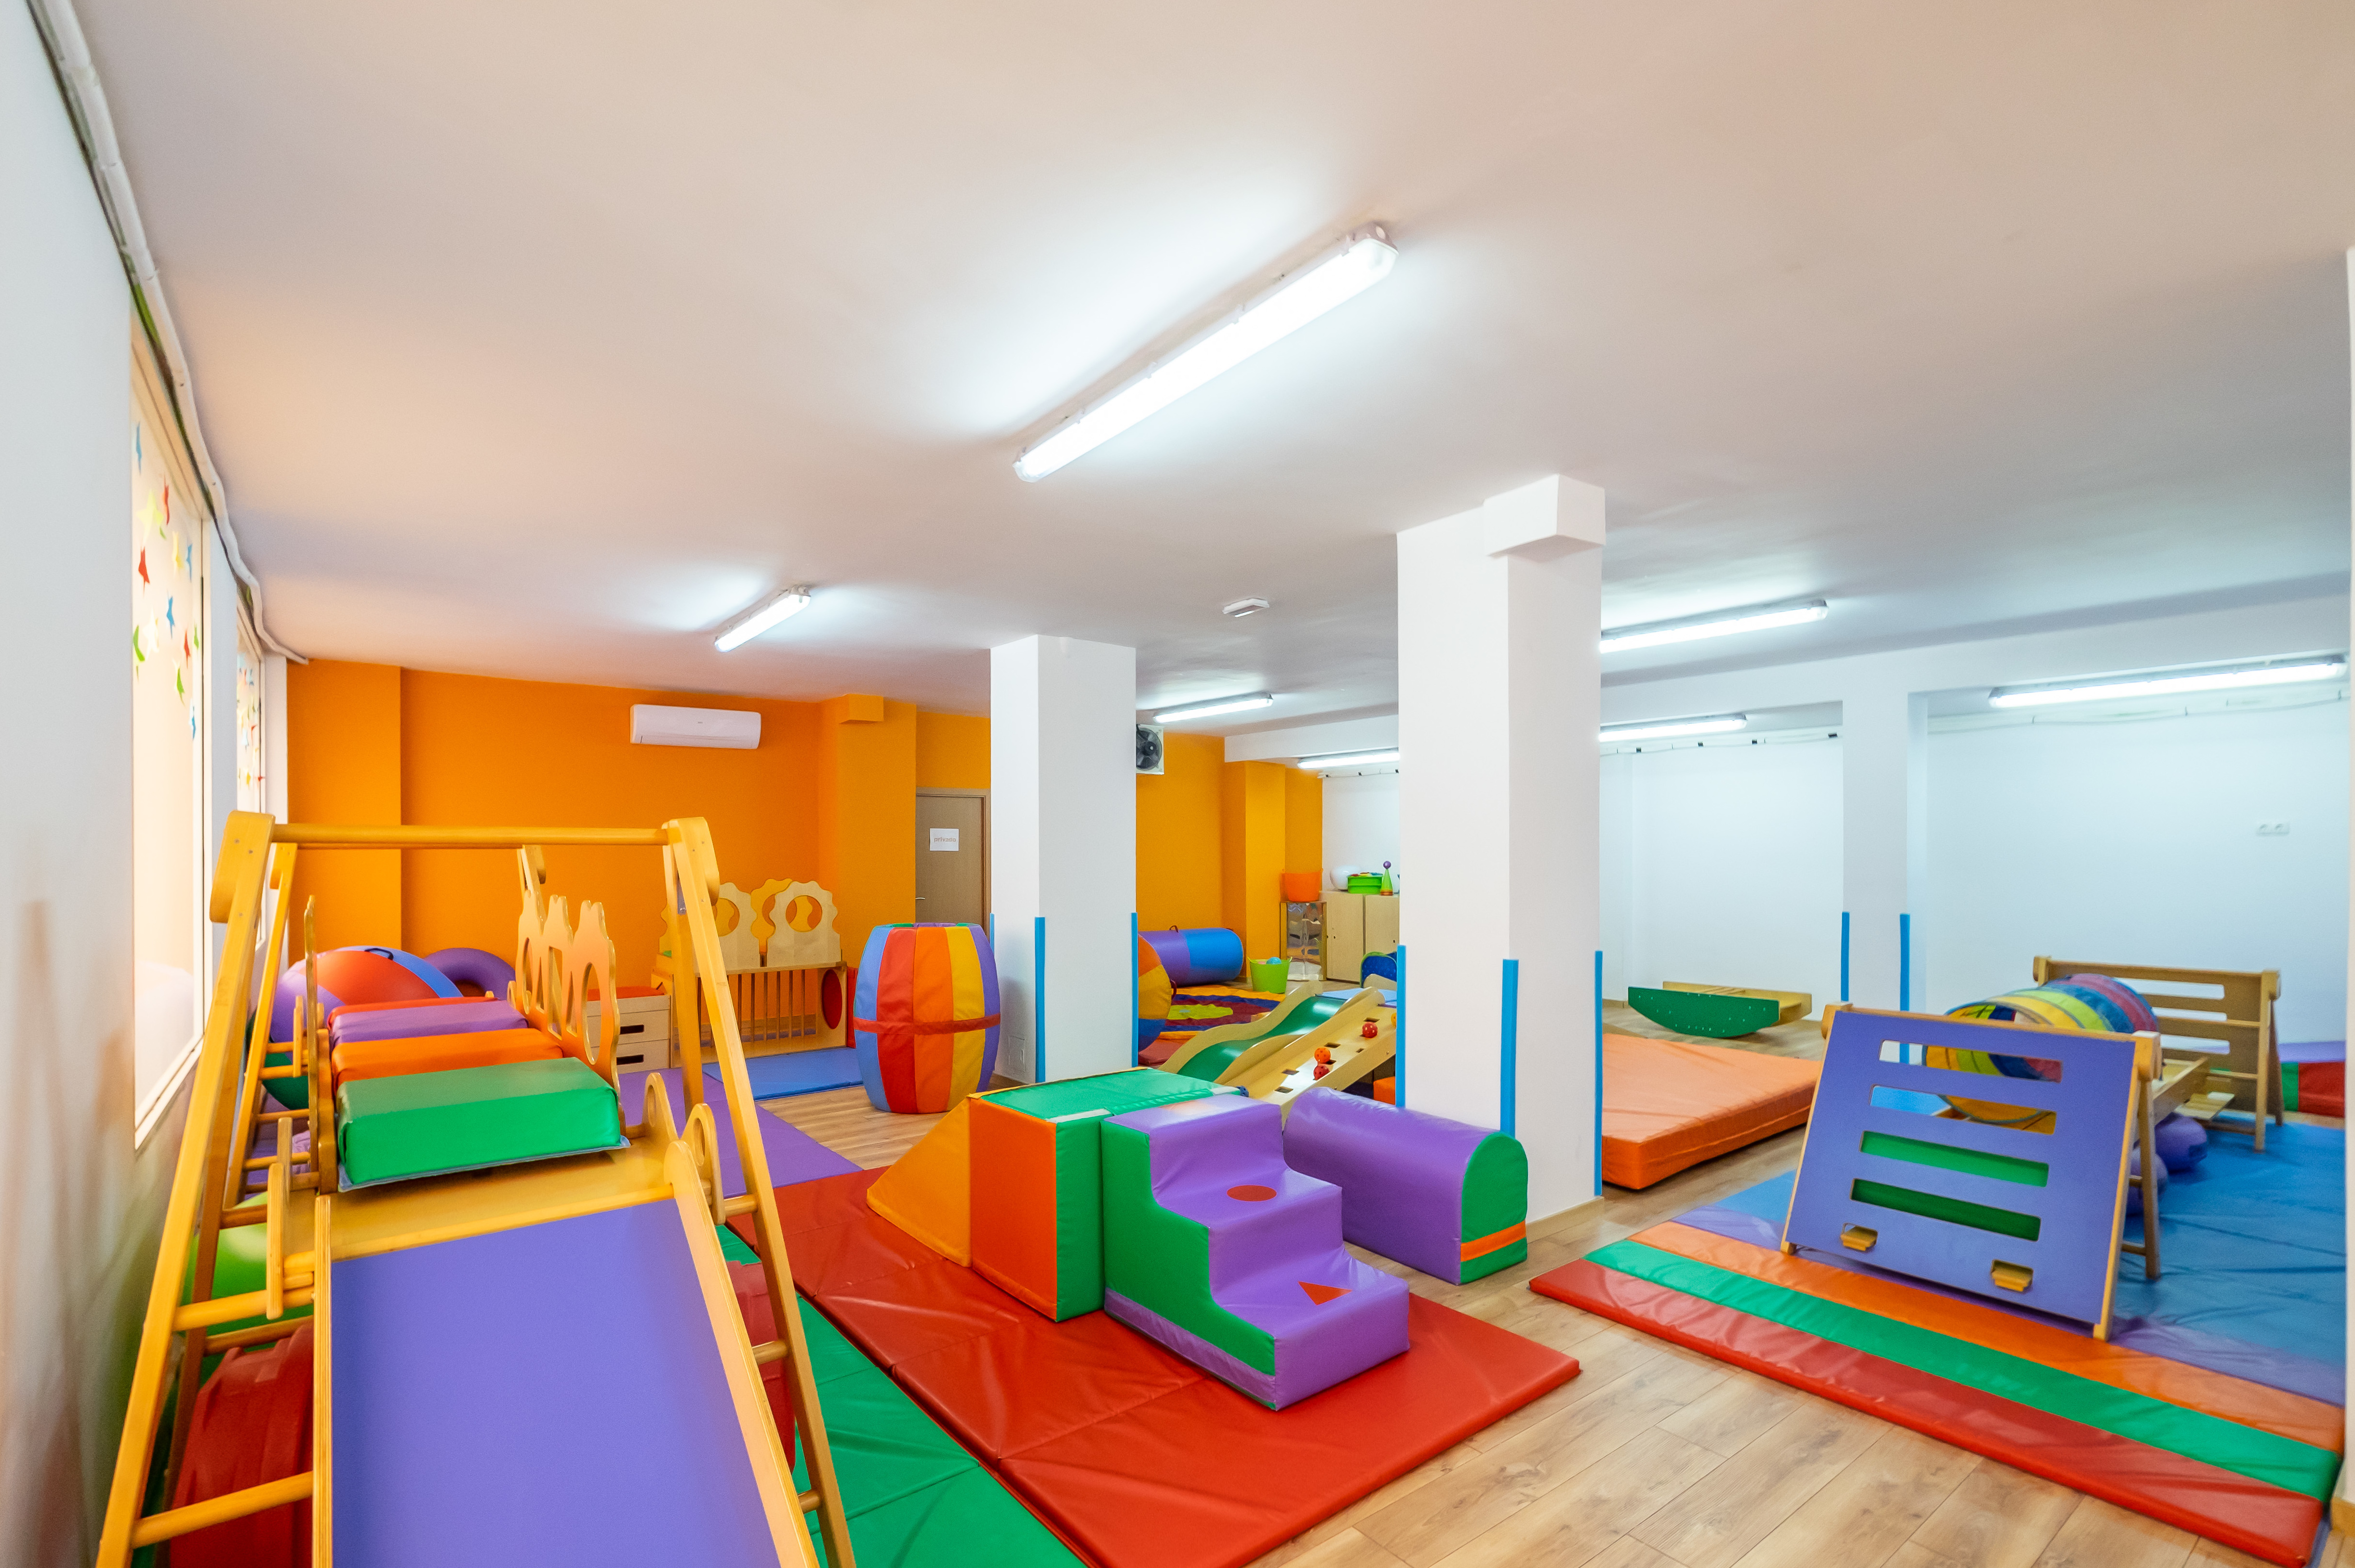 Foto 1 de Nursery schools en Sant Feliu de Llobregat | Gymboree Play & Music Sant Feliu